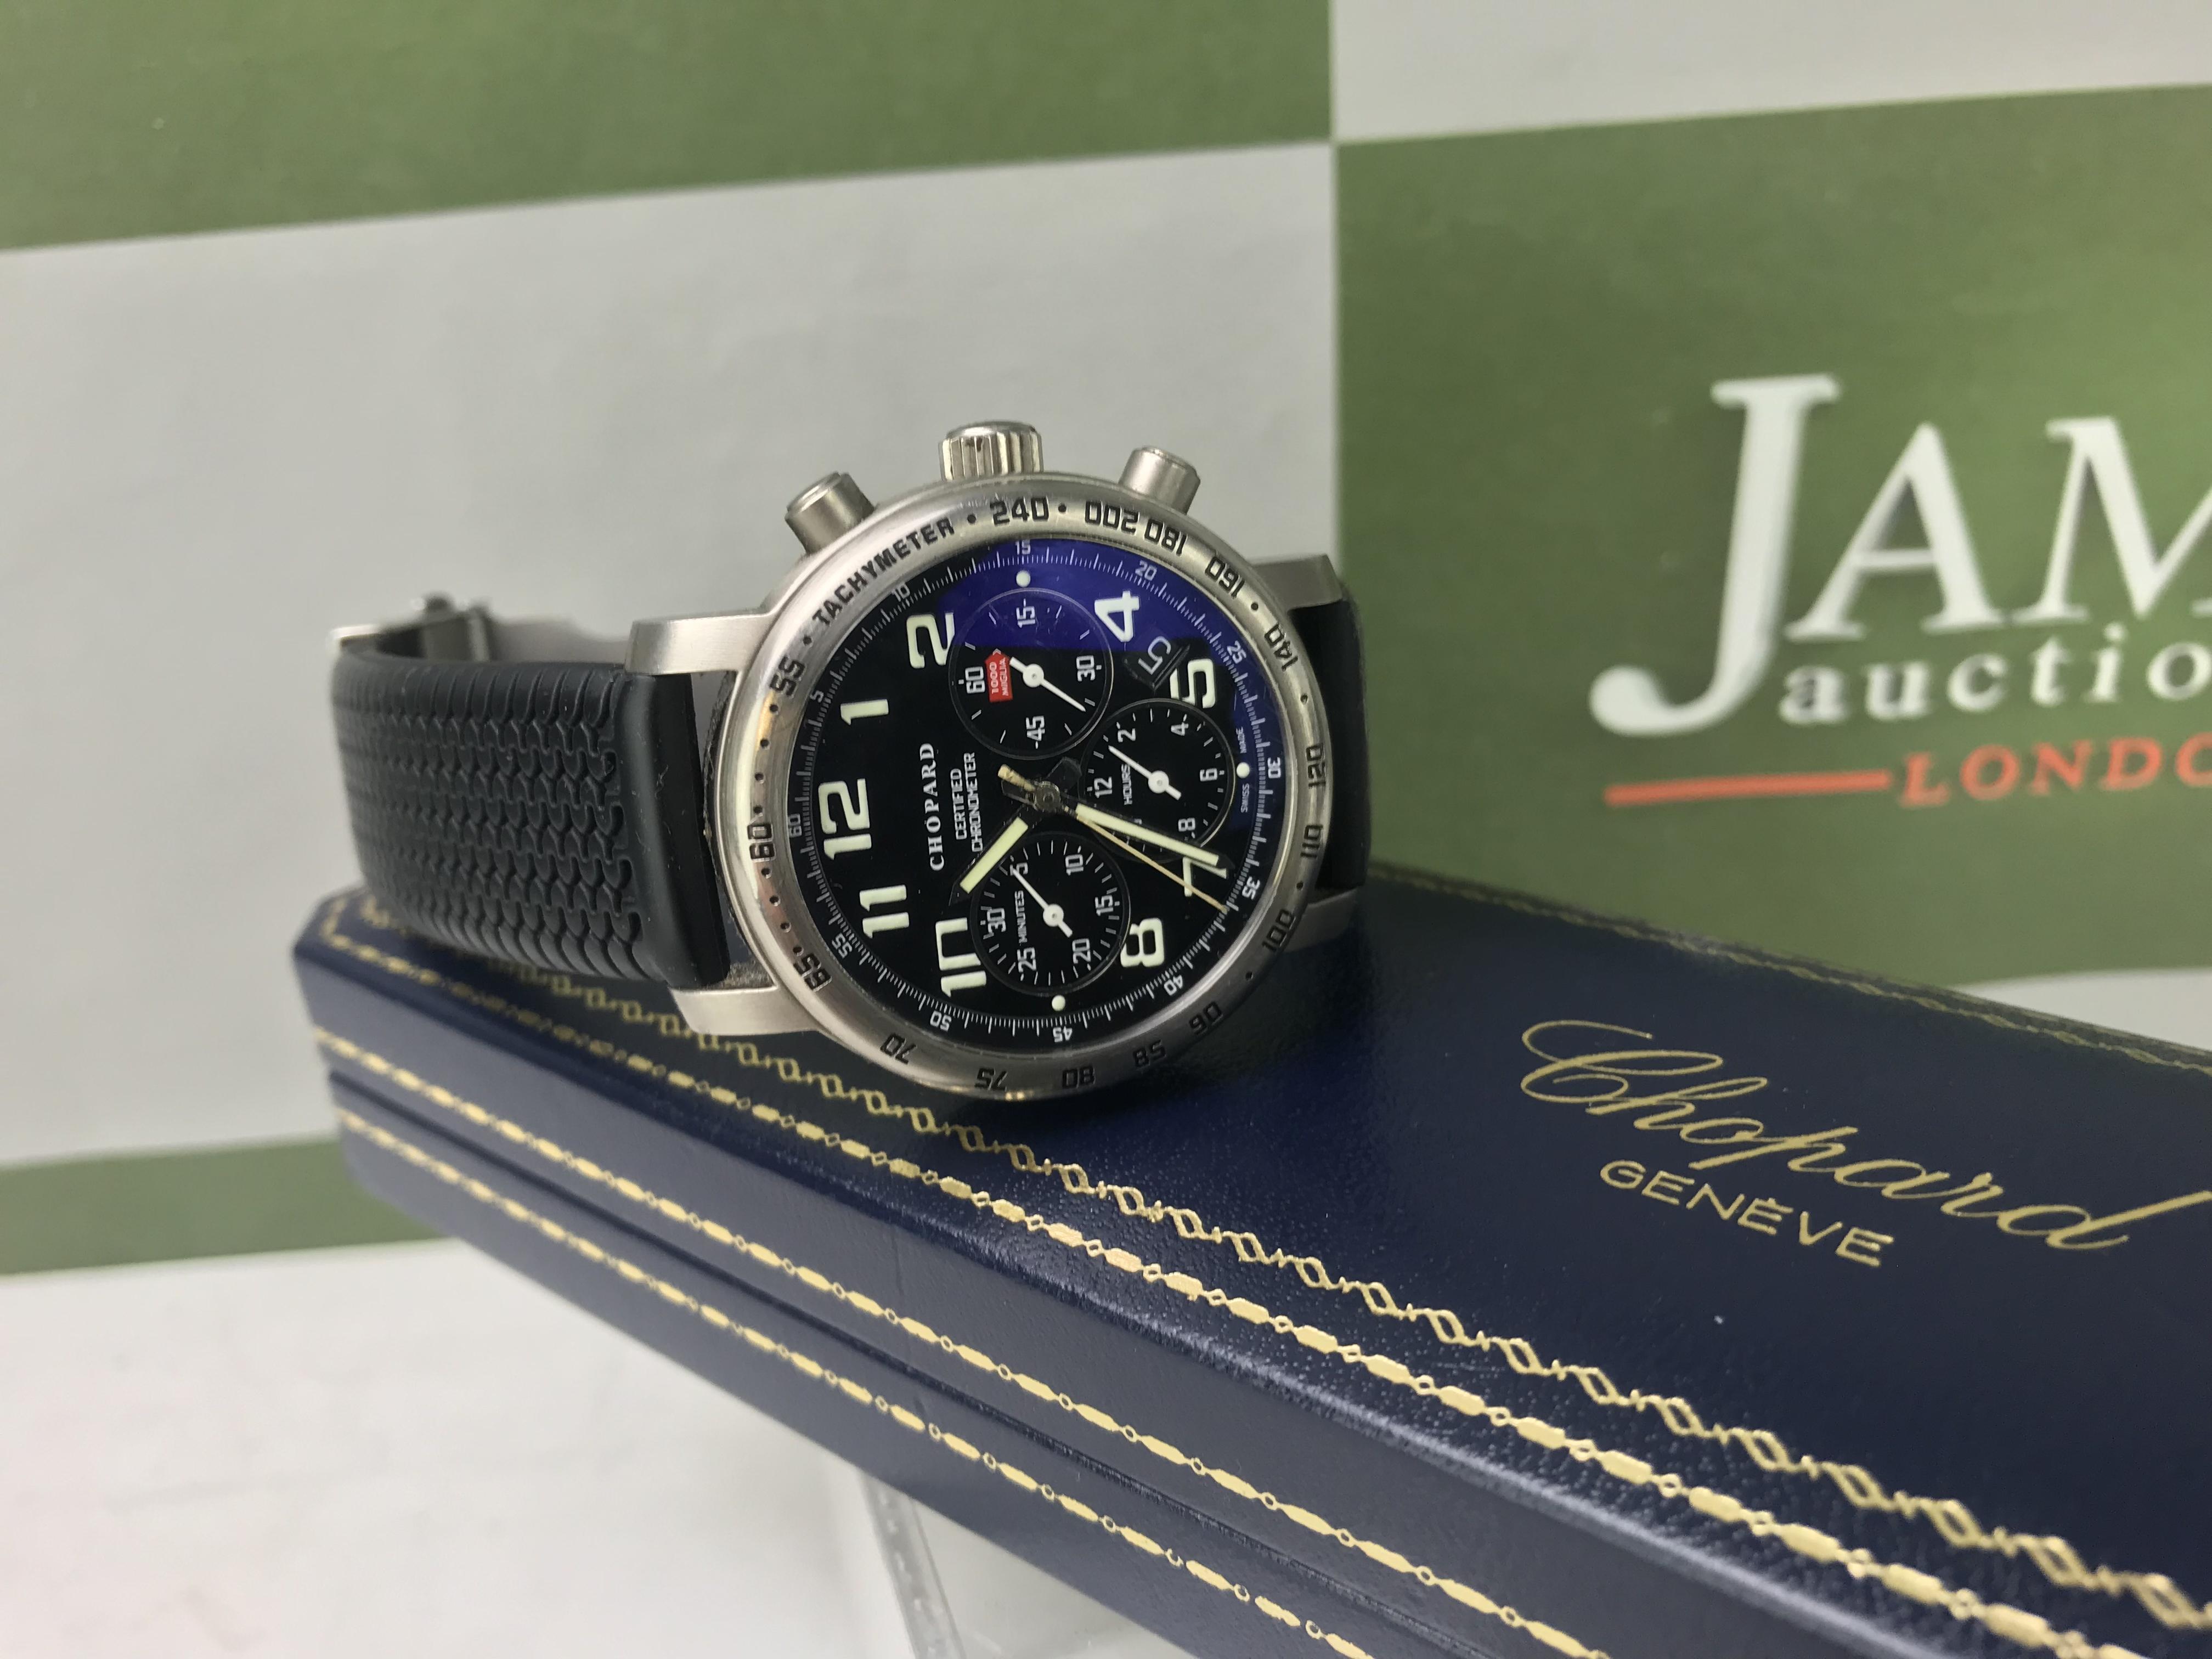 Lot 9 - Chopard Mille Miglia Titanium Chronograph Watch.